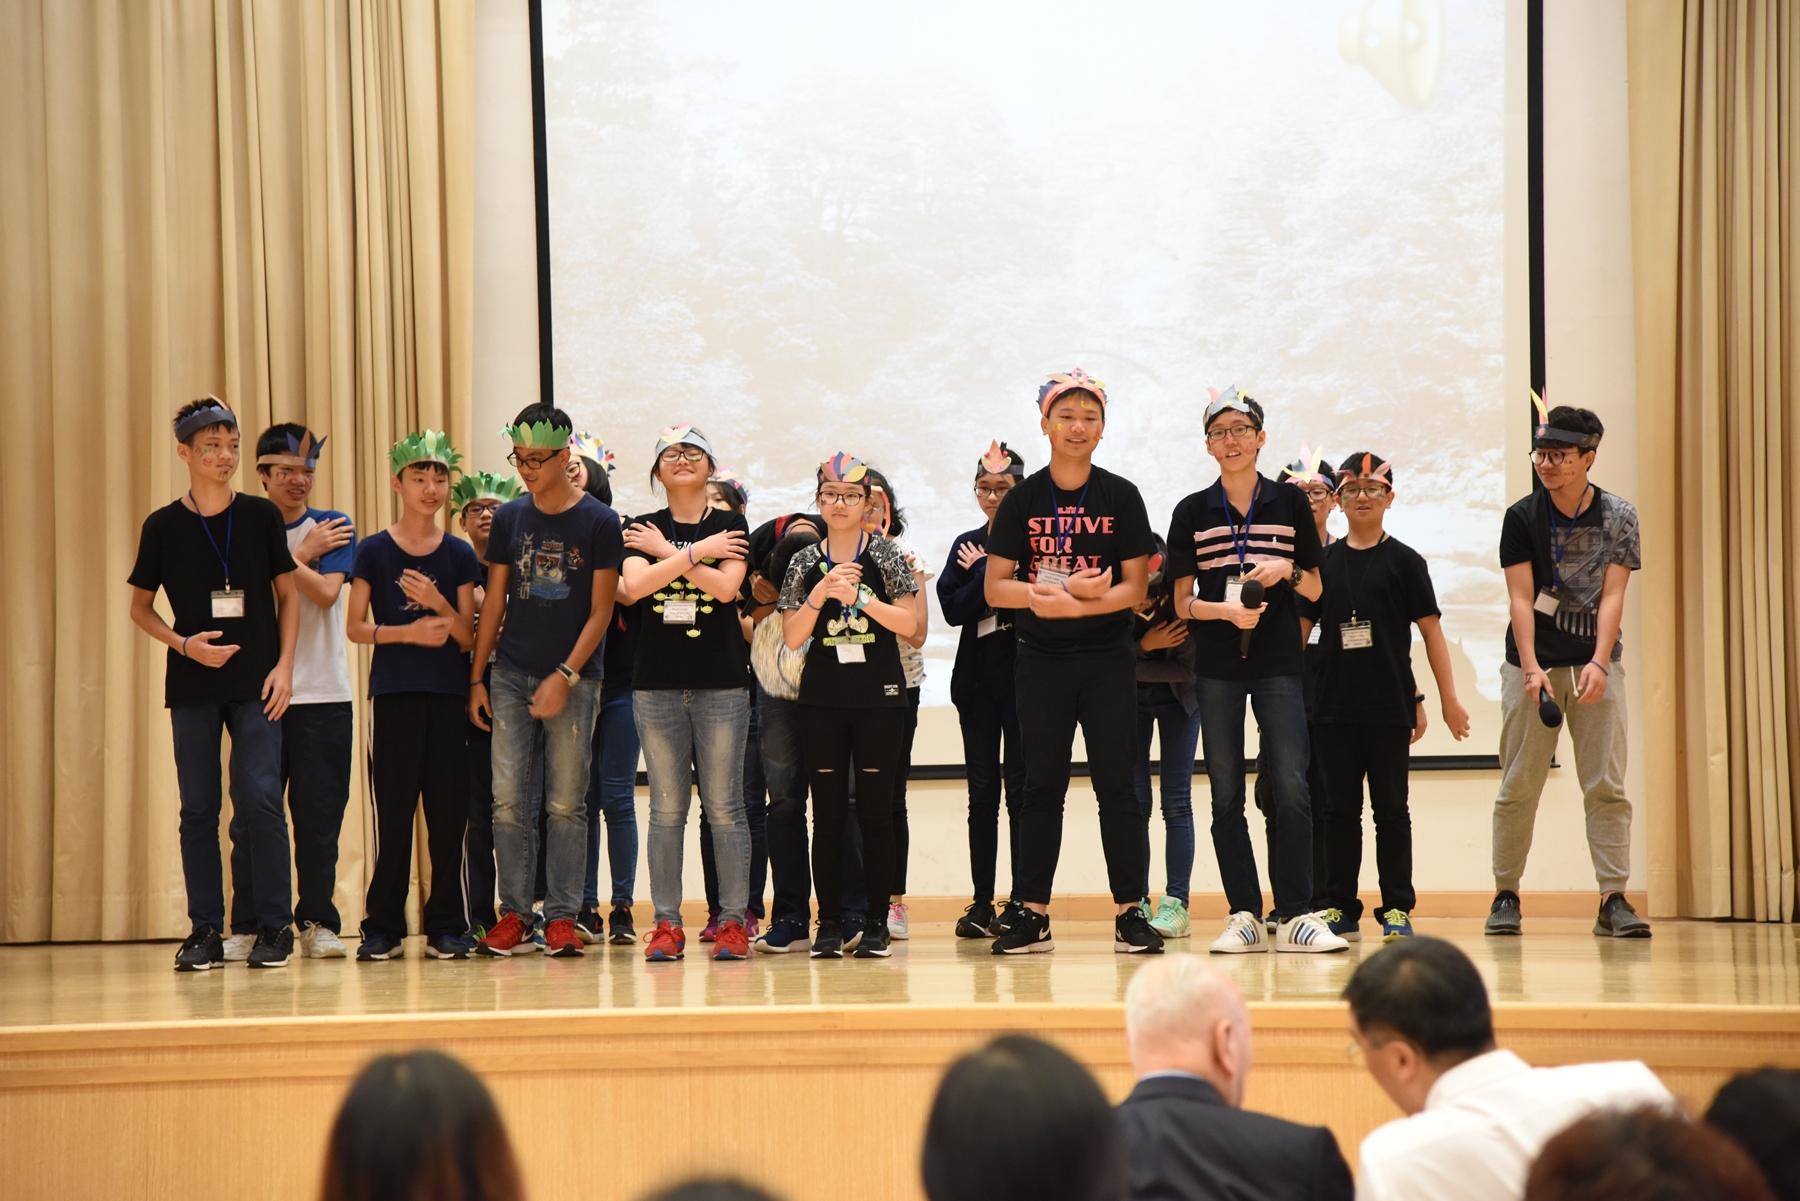 http://www.npc.edu.hk/sites/default/files/dsc_0230.jpg